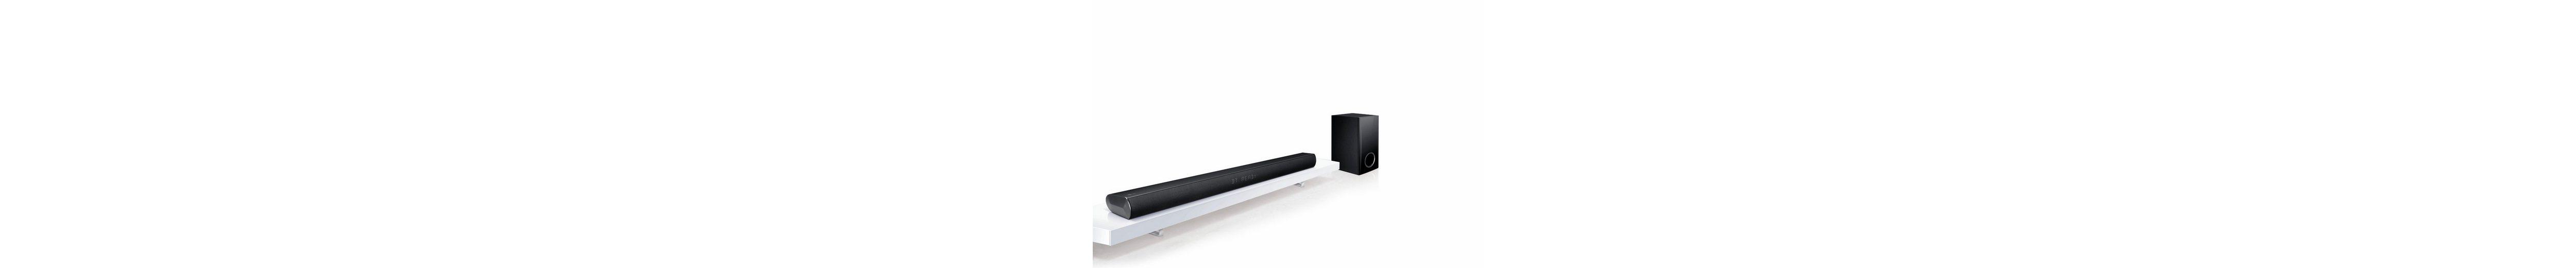 LG LAC450B 2.1 Soundbar (120 W, Bluetooth)